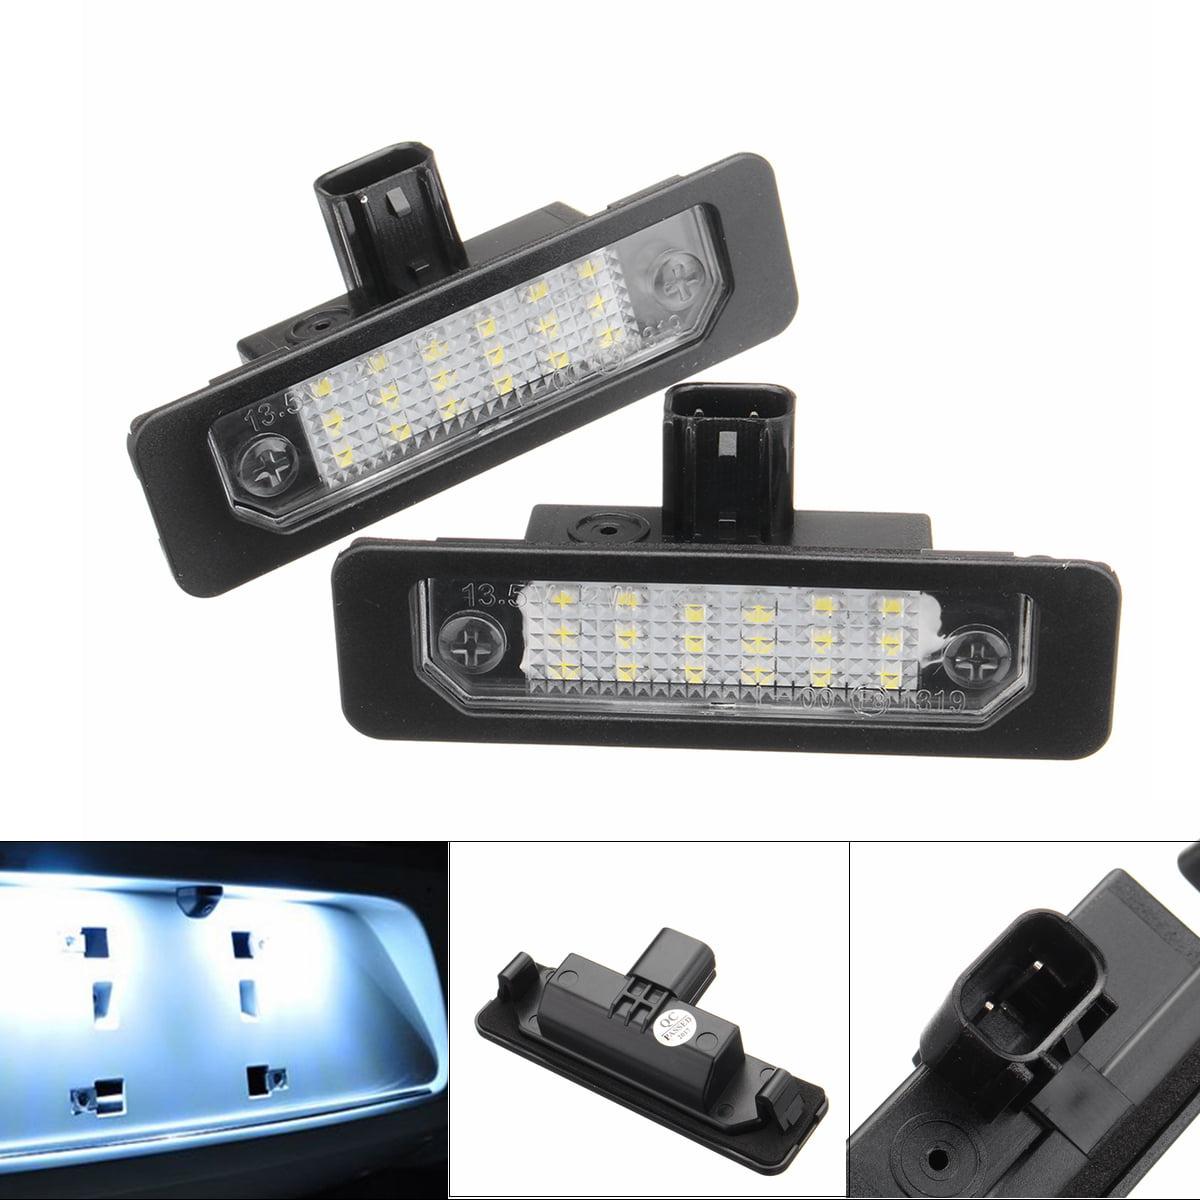 2x Universal Car License Plate Light Car Accessories Rearview Rear Left Right Light Lamps For Flex Taurus Focus